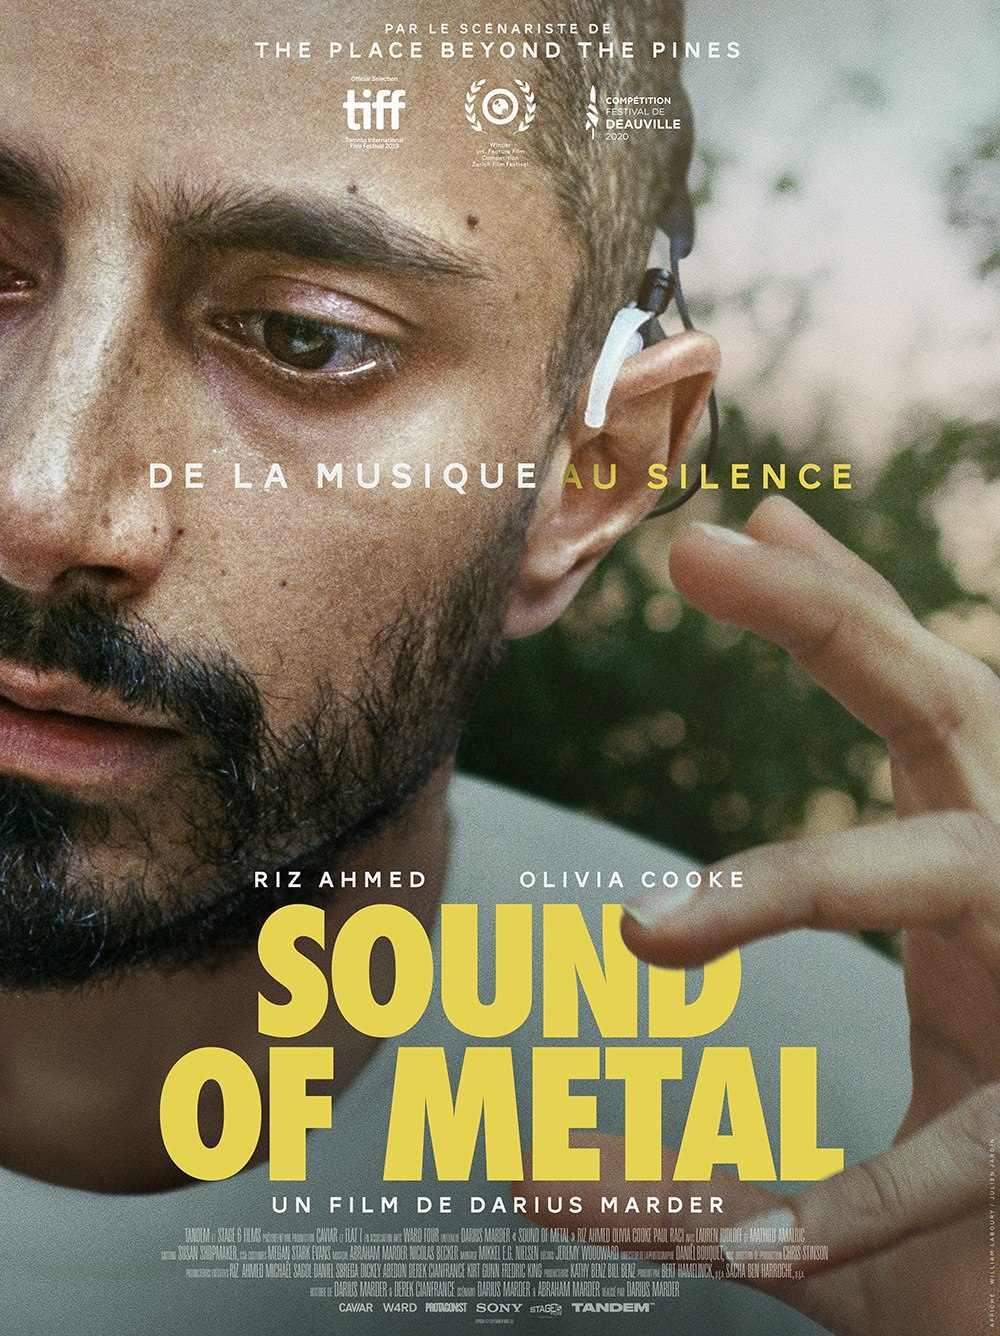 Soundofmetal2